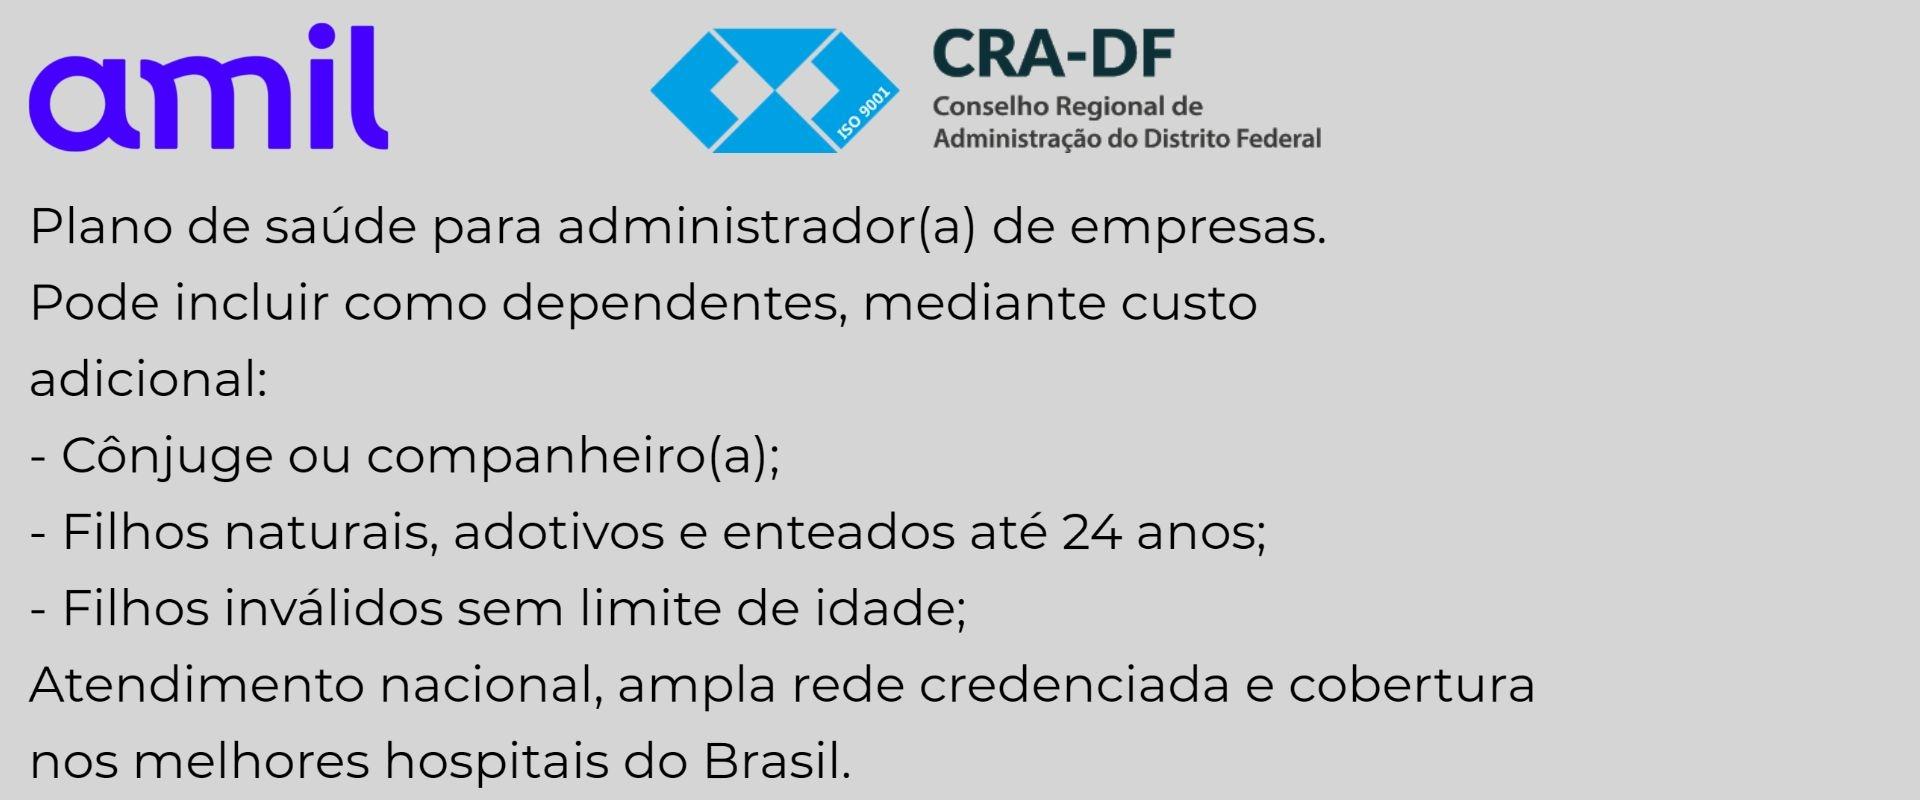 Amil CRA-DF